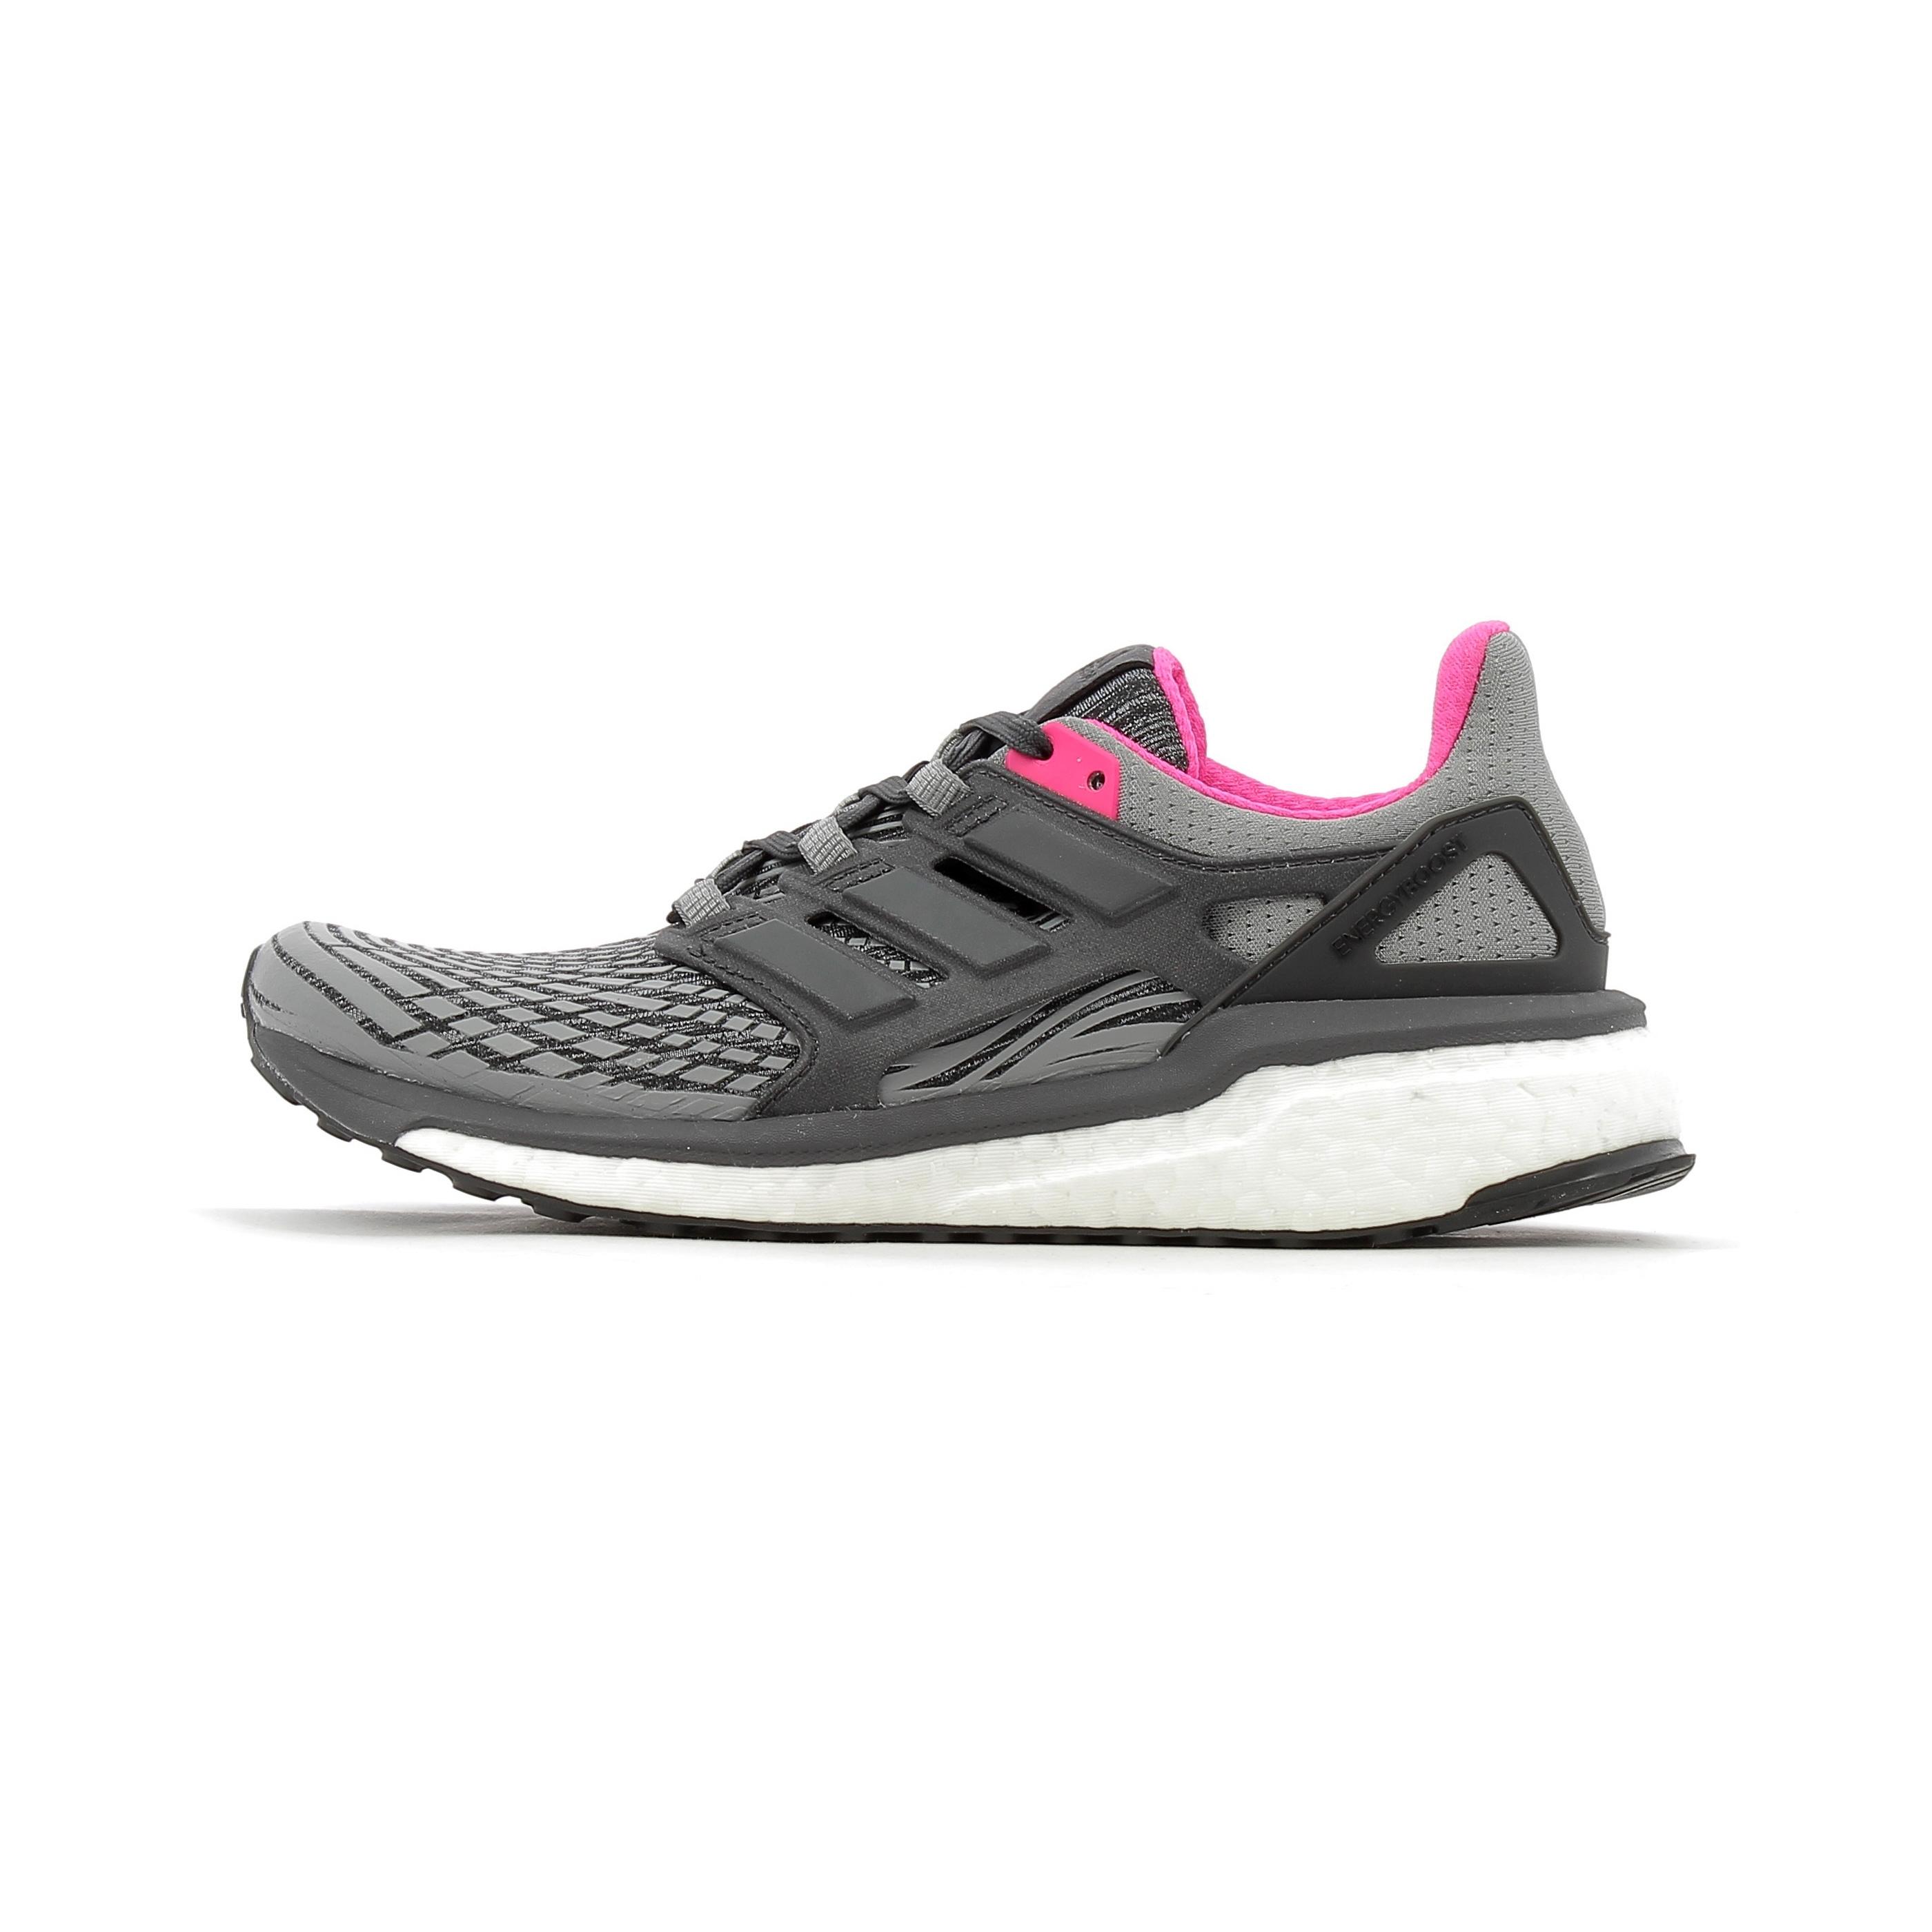 sélection premium e030f 94385 Chaussures de running Adidas Performance Energy Boost W